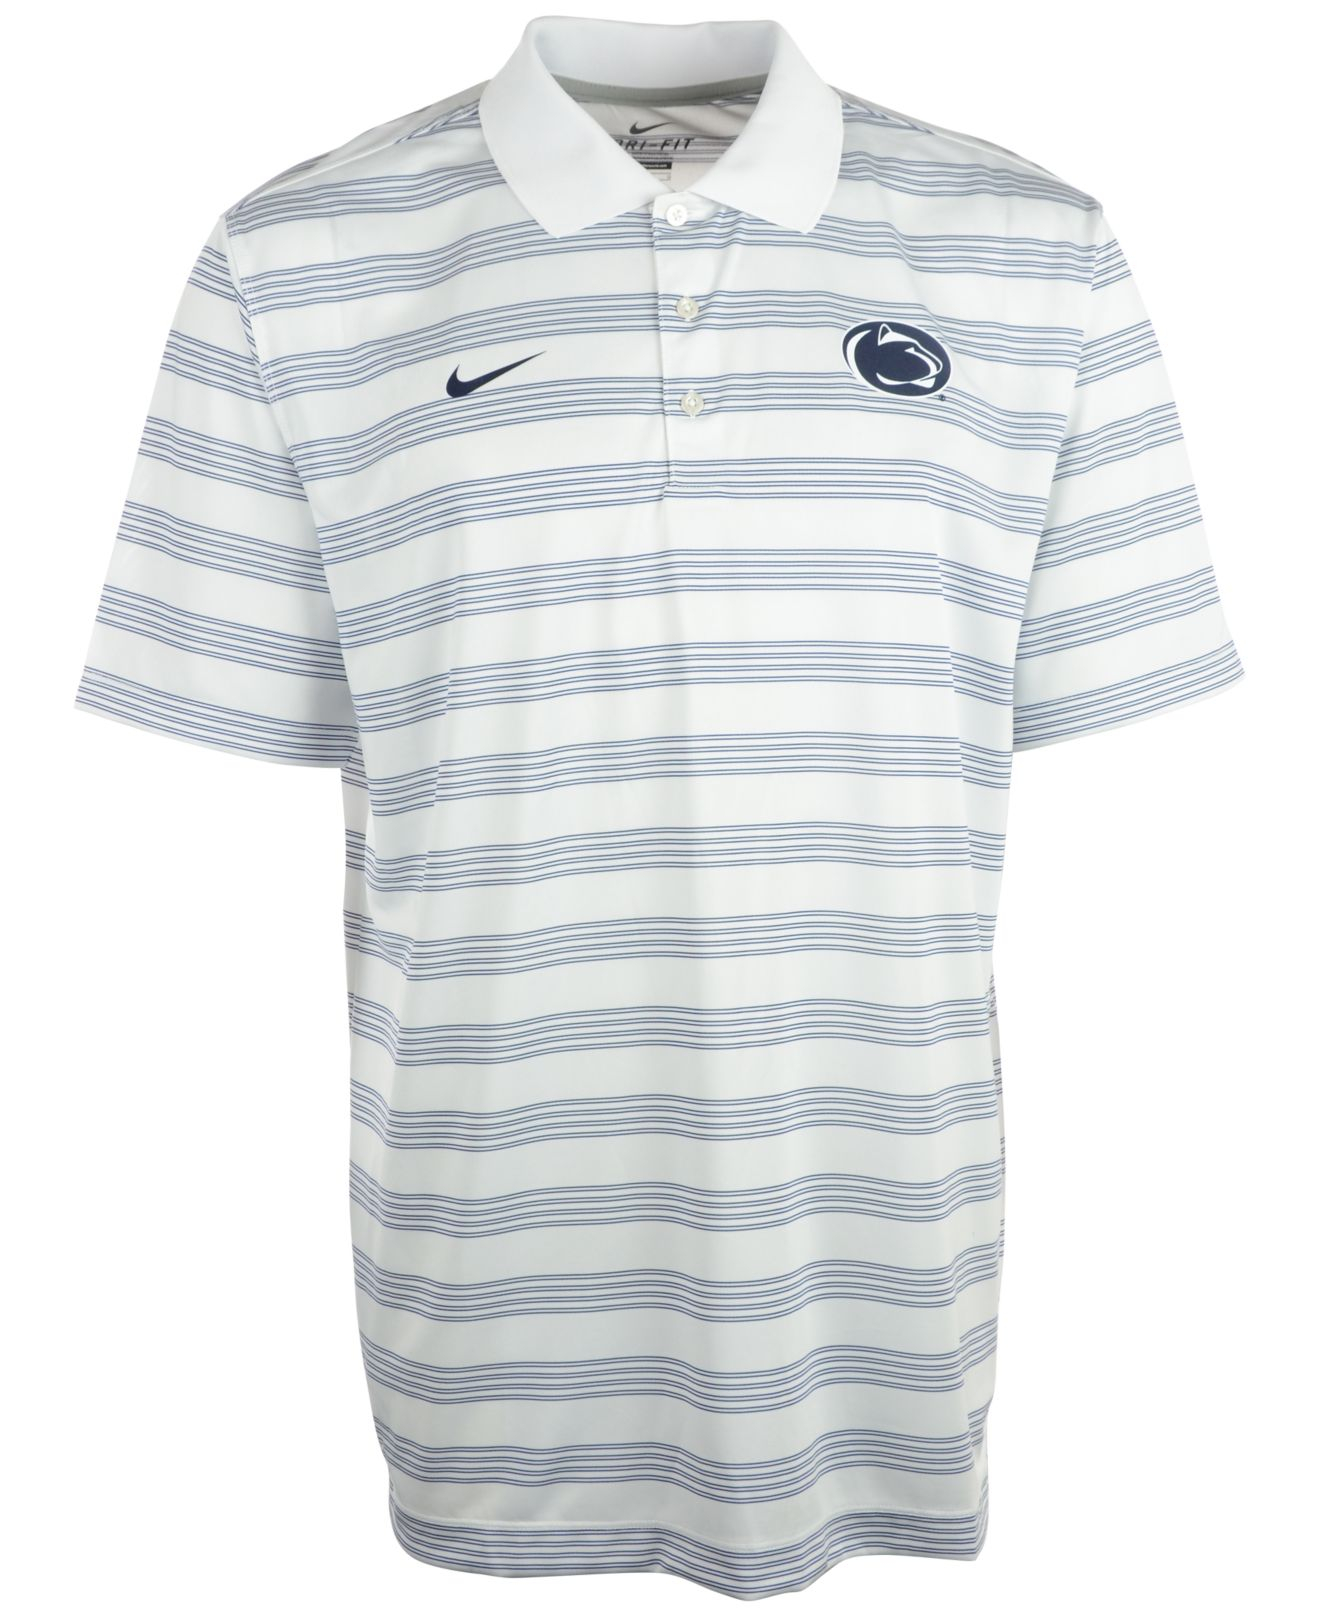 Lyst Nike Mens Penn State Nittany Lions Dri Fit Preseason Polo